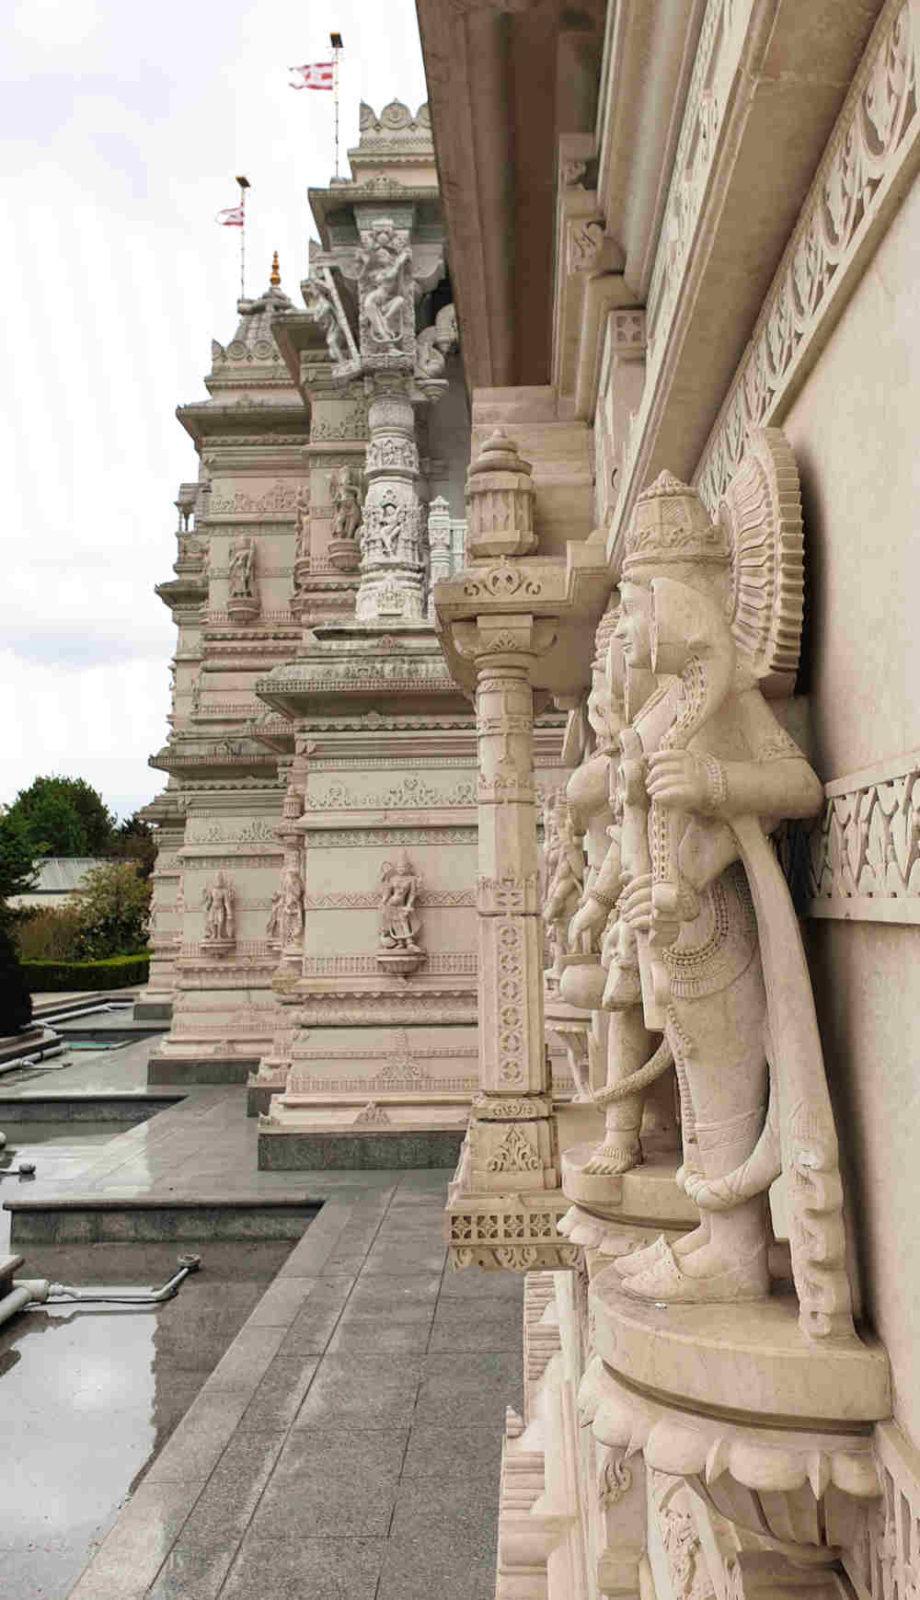 Neasden Temple carvings, architecture, exterior, how it was built